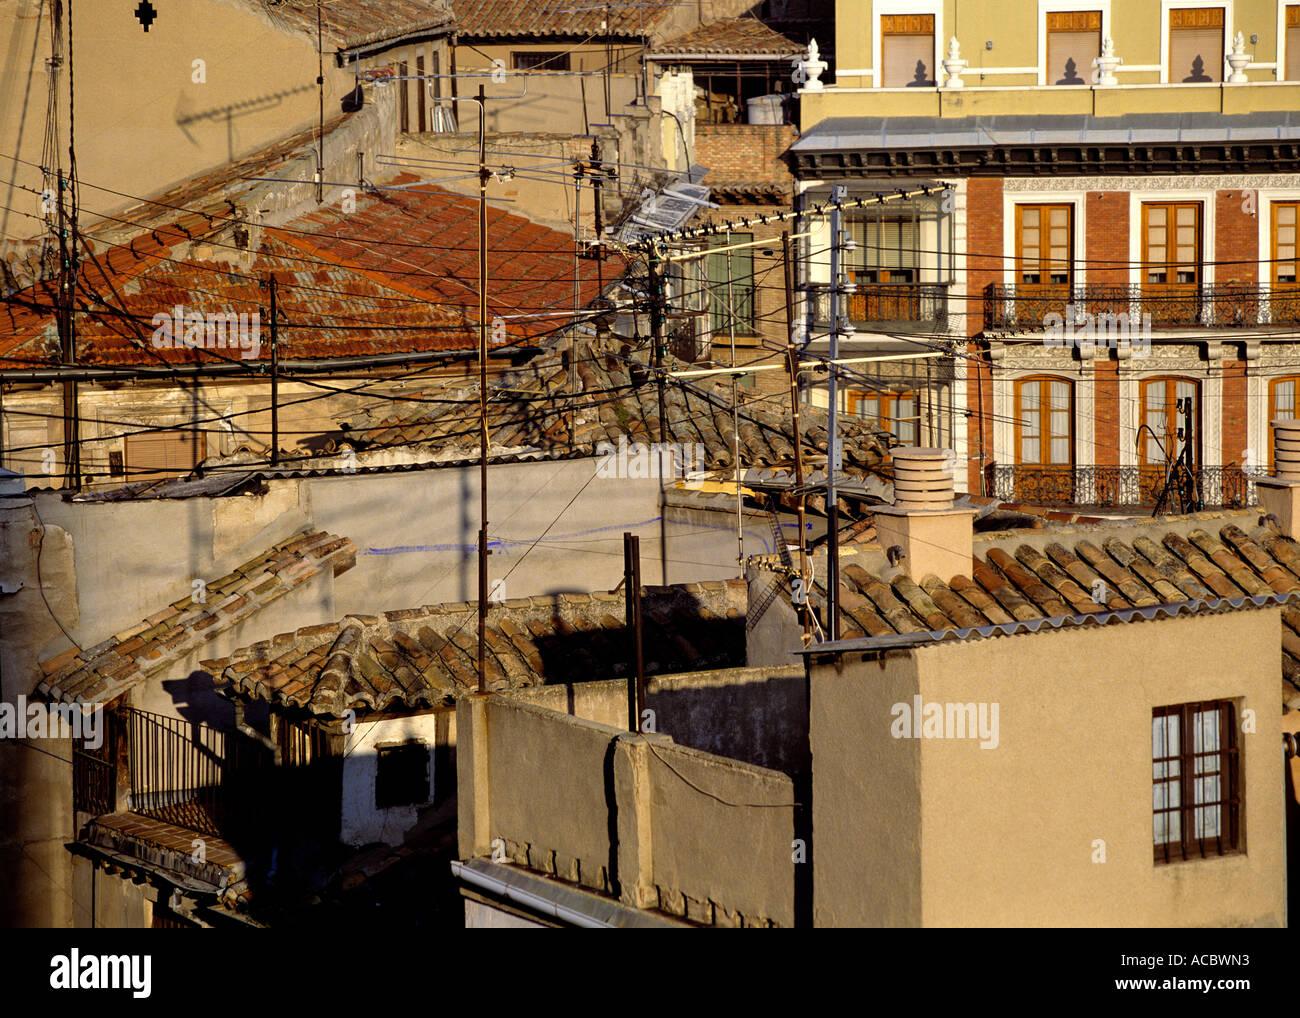 Antennen am Morgen Stadt Toledo alte Stadt Region Kastilien-La Mancha Spaniens Stockbild